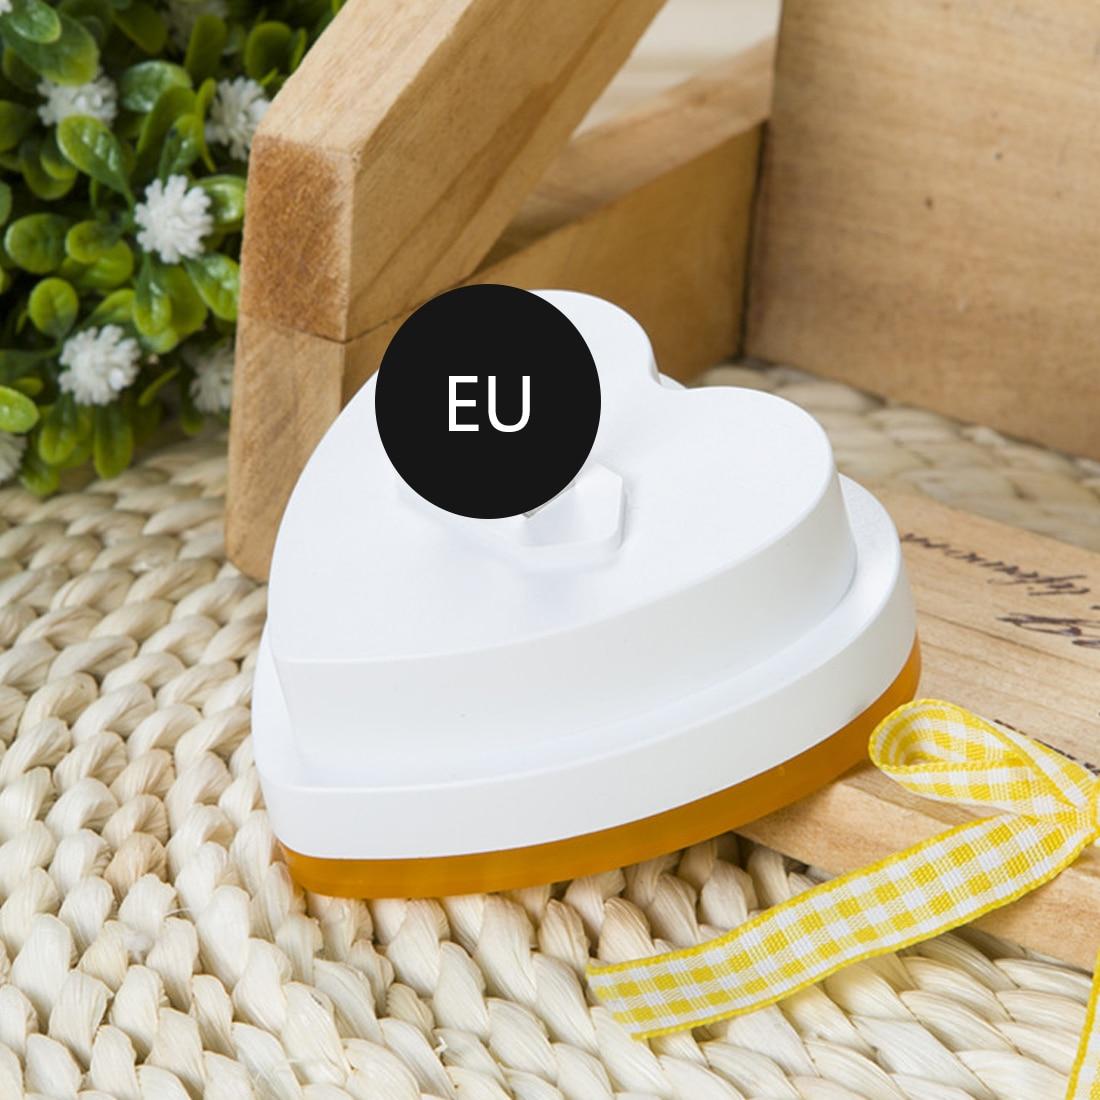 LED Light Induction Sensor Control Bedroom Night Lights Auto Bed Lamp Heart Shape 110-220V EU Plug 4 Colors